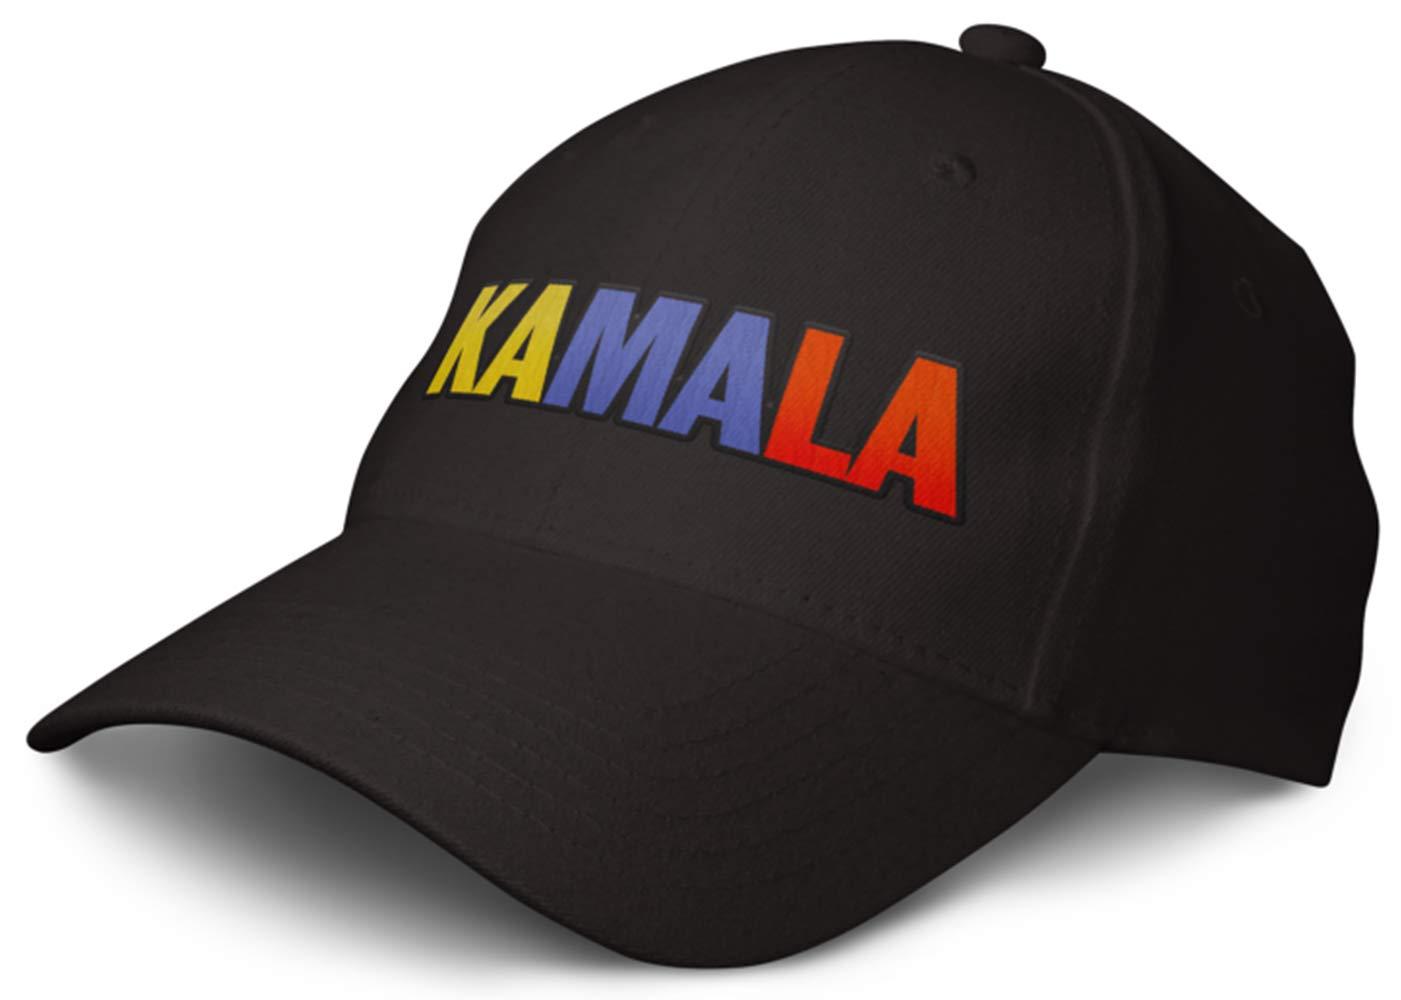 KamalaHarris President 2020 Cap: Kamala Black 6 Panel Structured Adult Baseball Cap